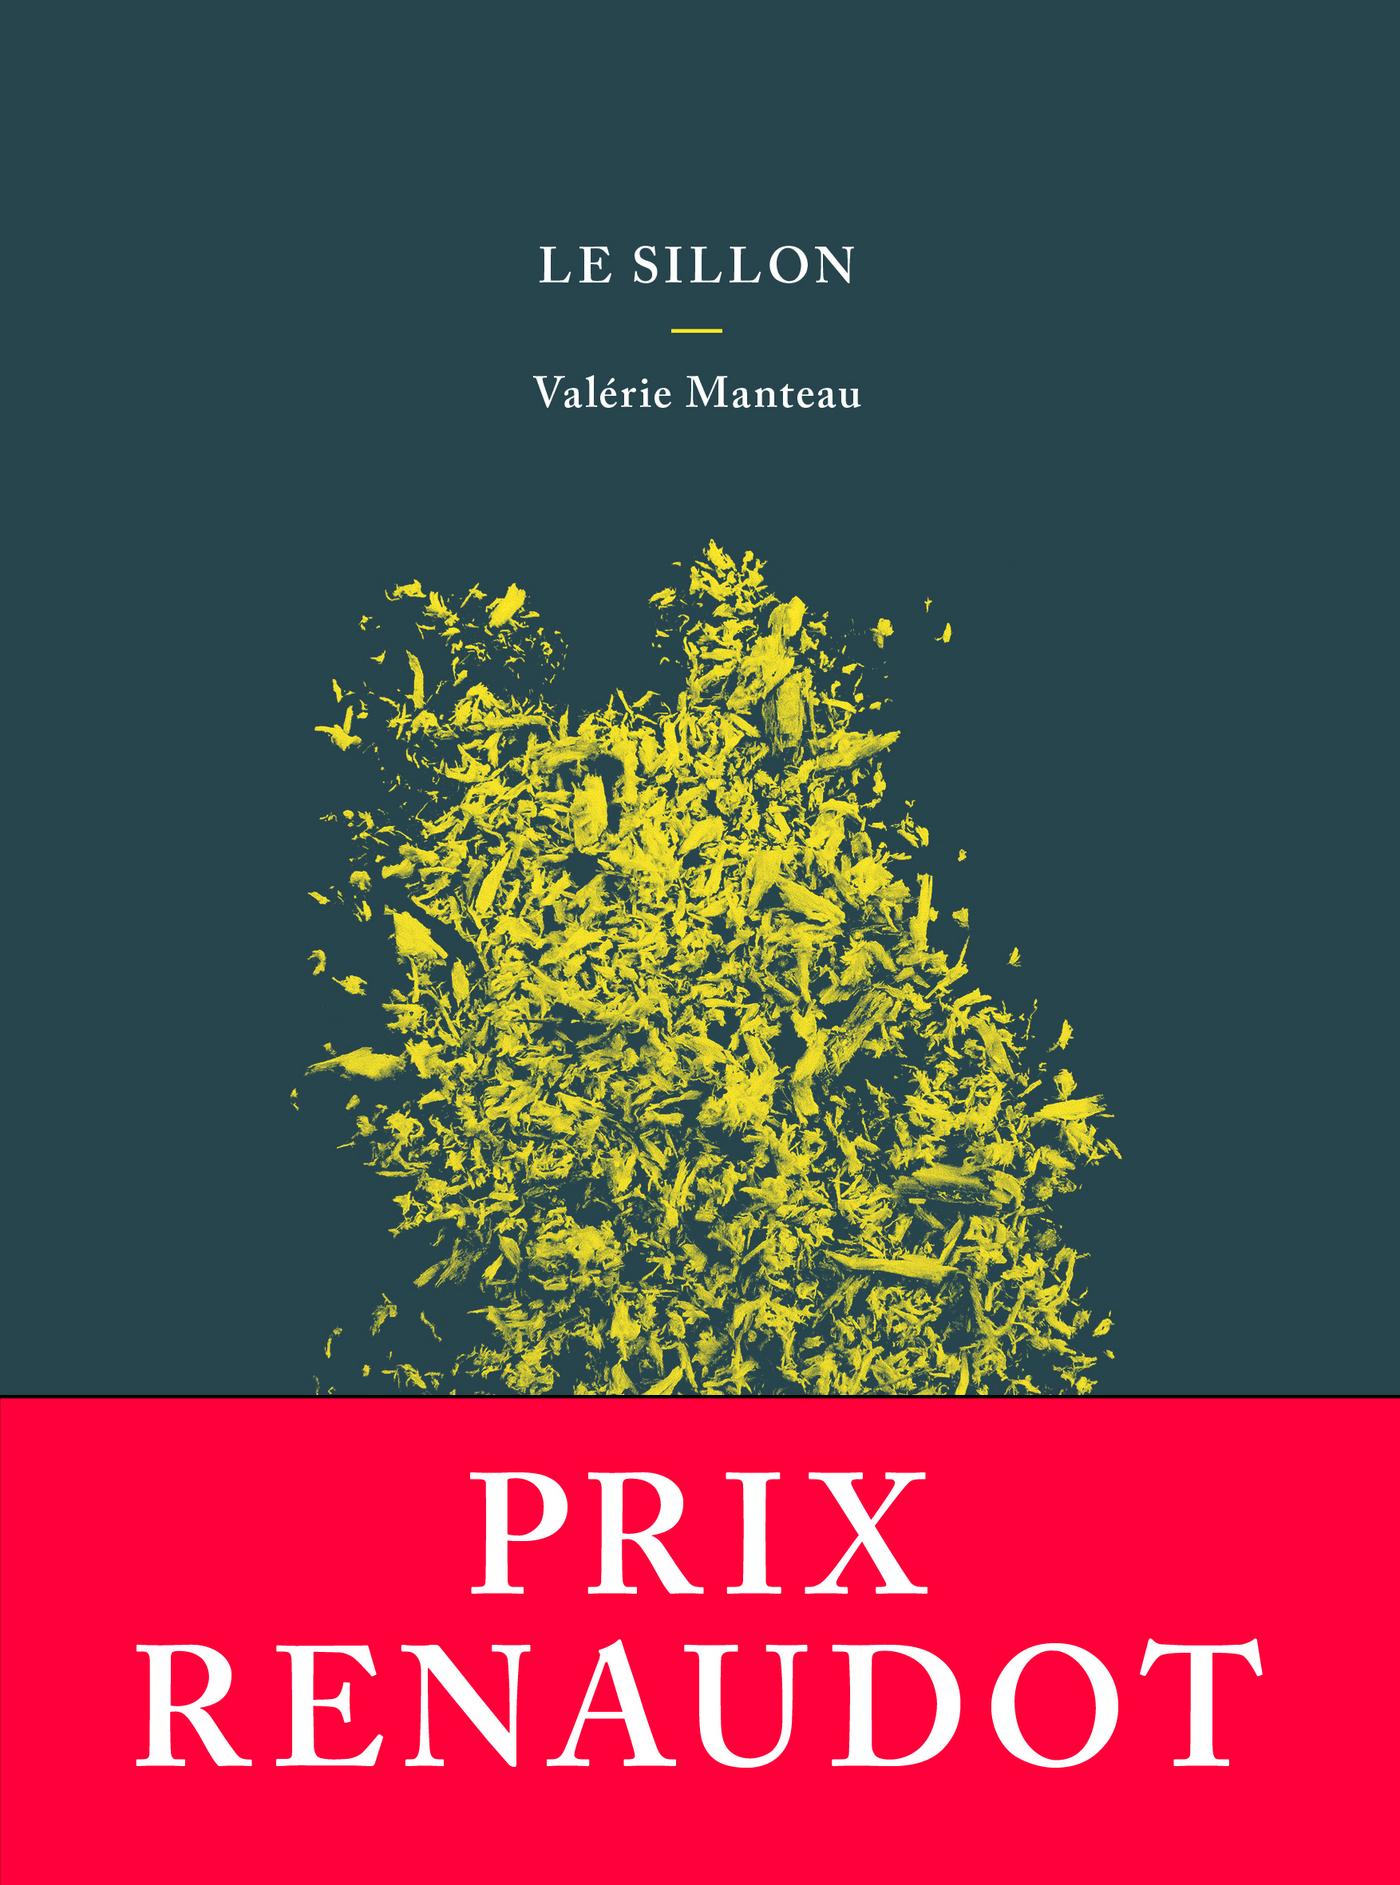 Le sillon - Prix Renaudot 2018